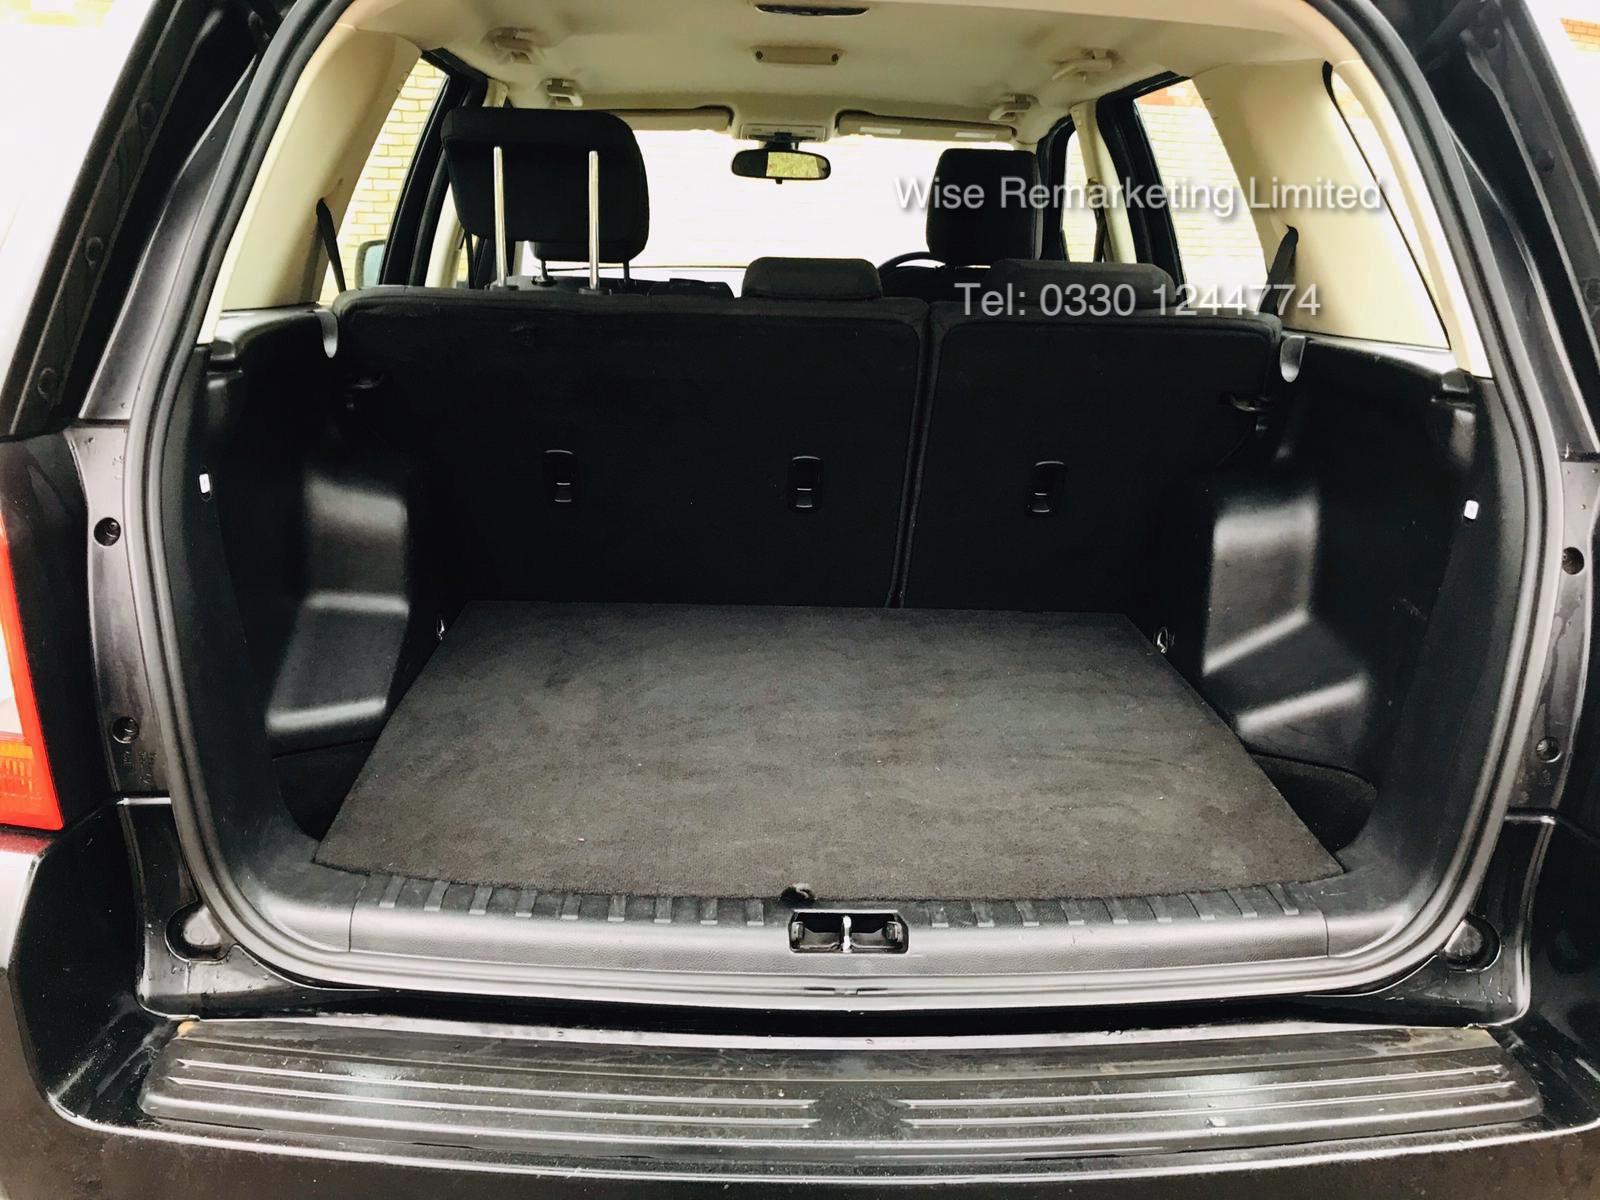 (RESERVE MET)Land Rover Freelander GS 2.2 TD4 Auto - 2009 09 Reg - Service History - Sat Nav - Image 8 of 27